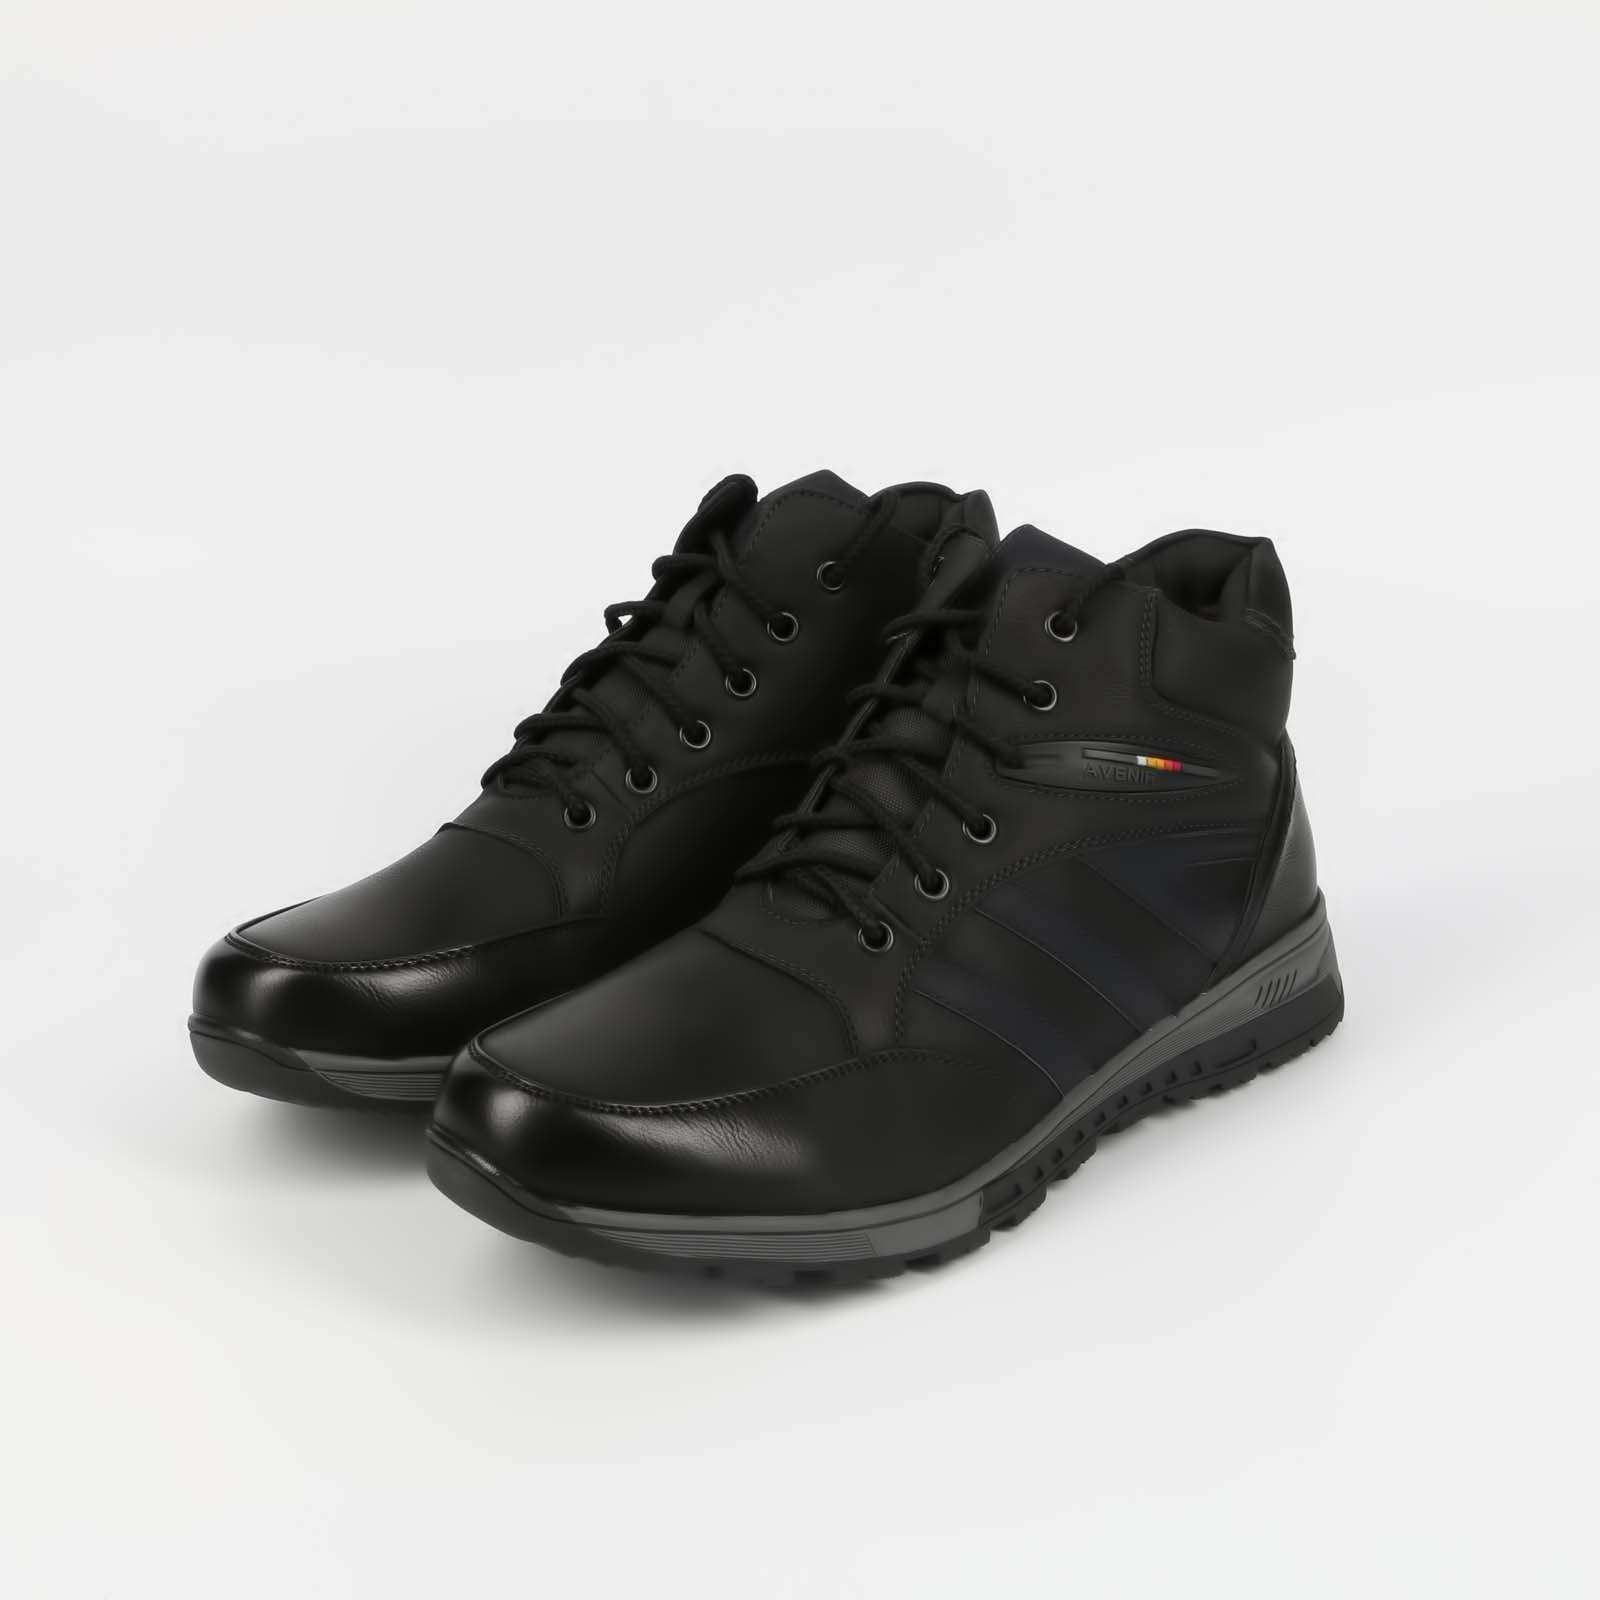 Ботинки мужские с полосками